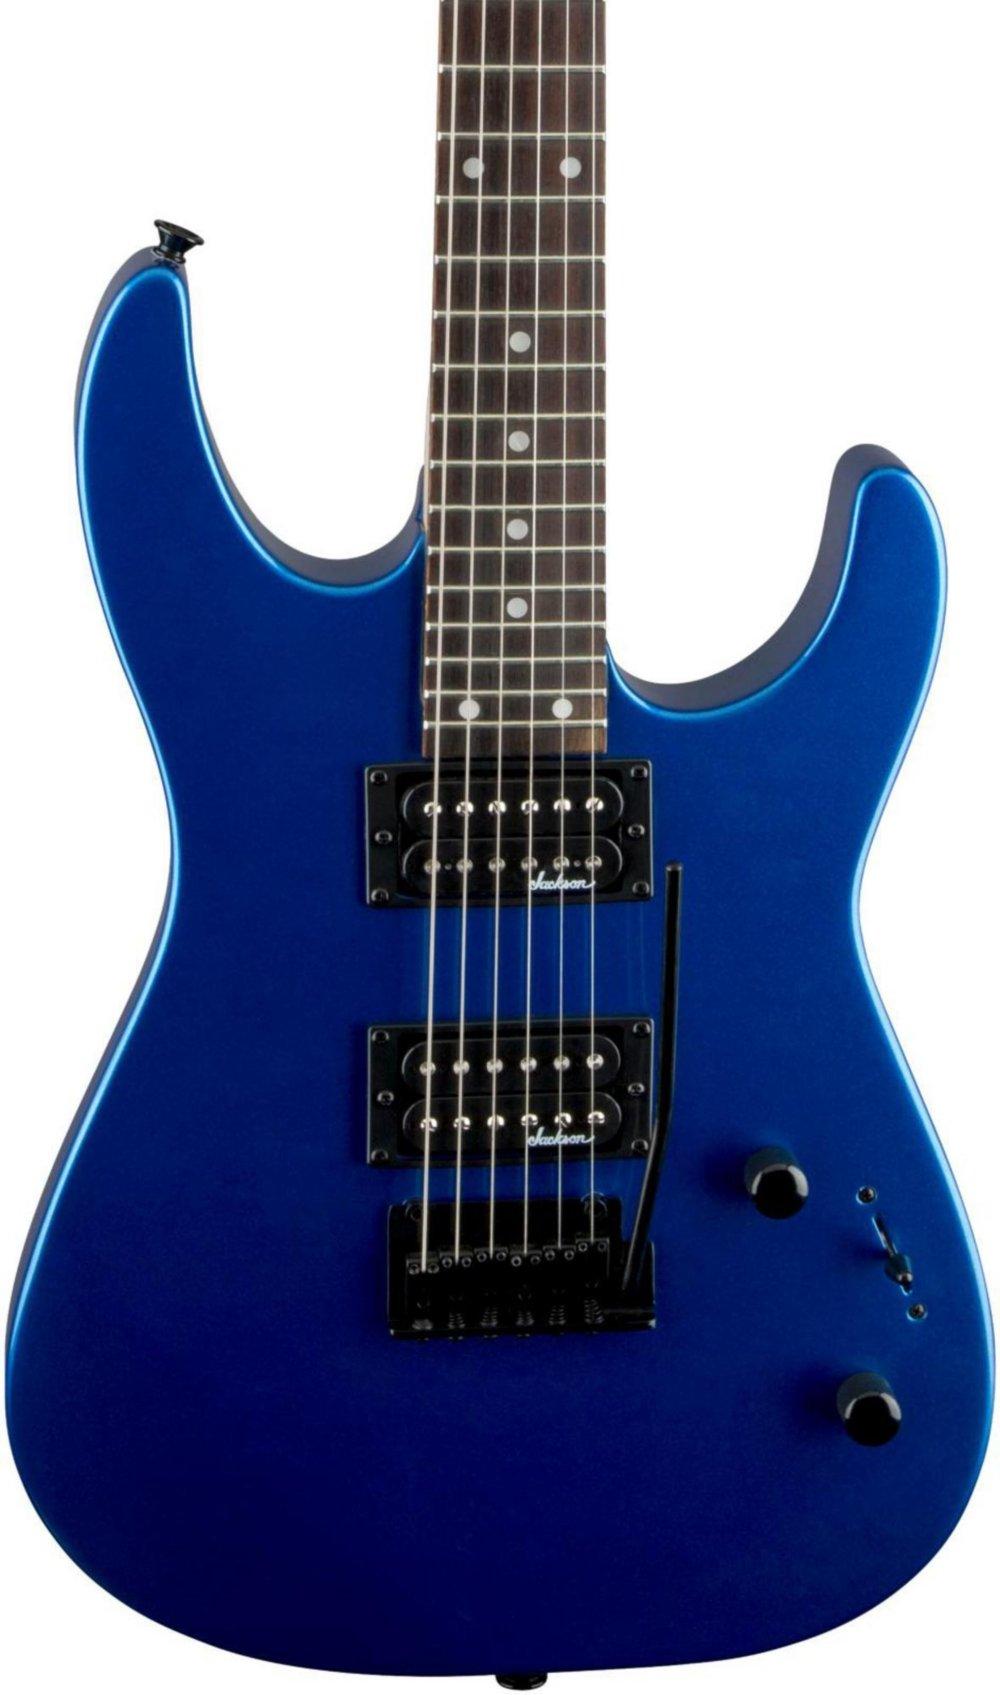 Cheap Jackson JS12 Electric Guitar Dark Metallic Blue Black Friday & Cyber Monday 2019